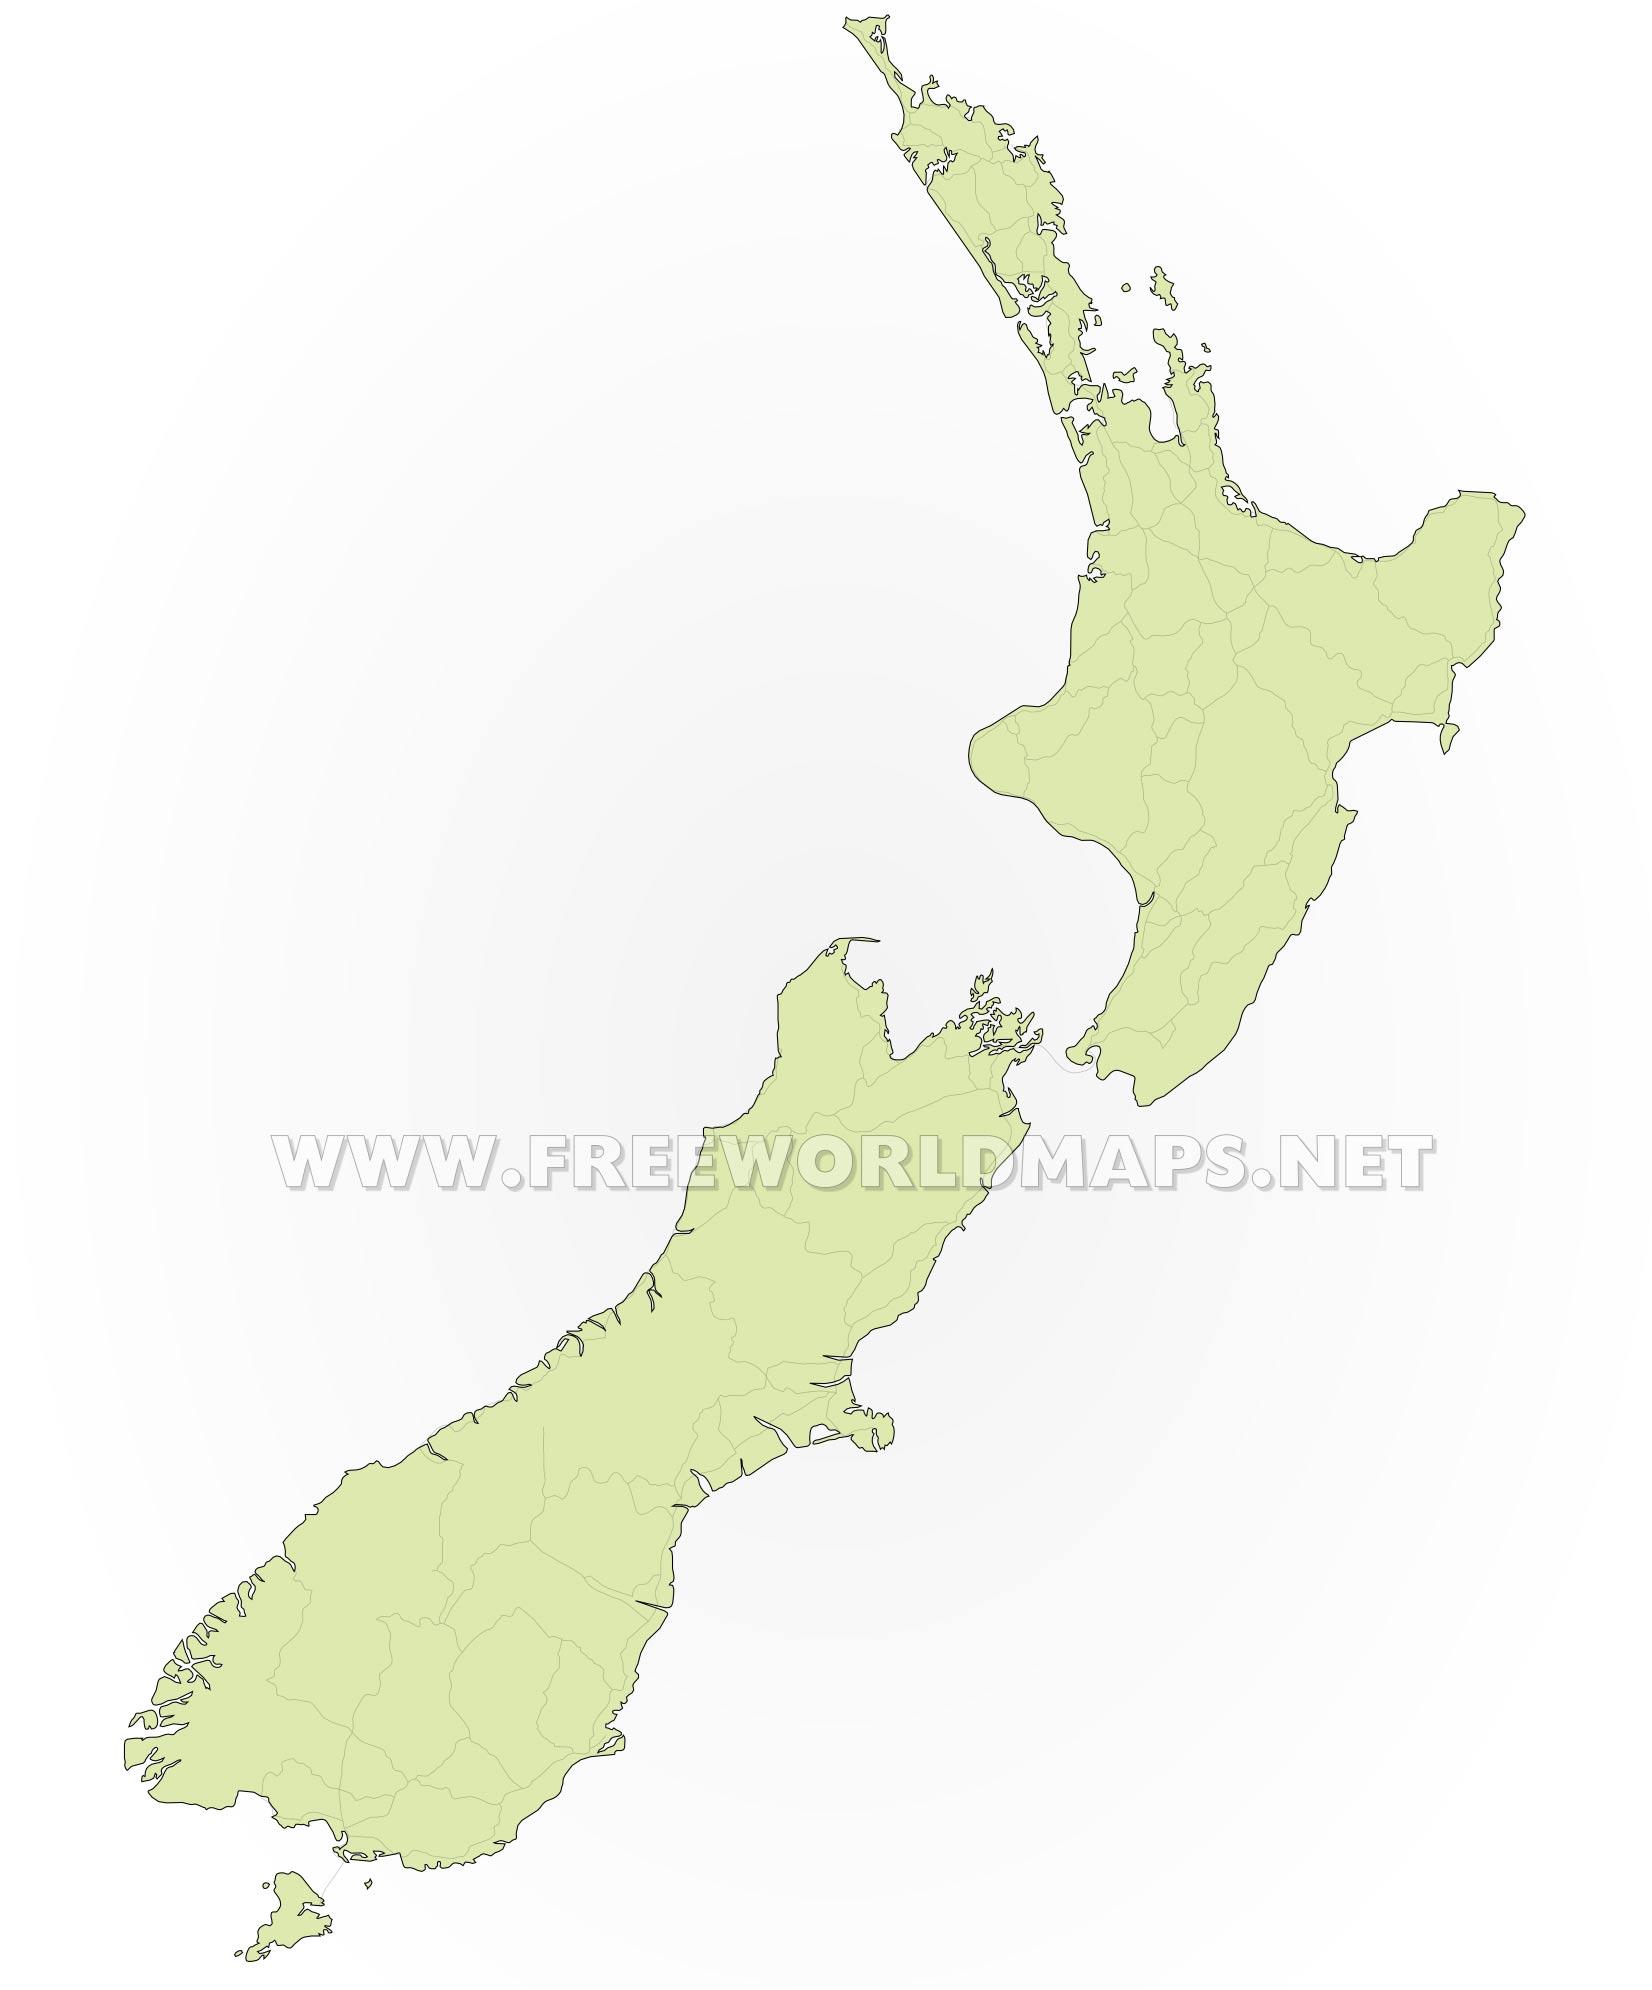 New Zealand Political Map on hawkes bay map, dunedin map, rotorua map, golden bay map, matamata map, vatican city map, manawatu map, palmerston north map, saudi arabia map, northland map, auckland city map, shark bay map, queenstown map, taranaki map, waikato map, saint kitts and nevis map, north island map, tauranga map, far north map,